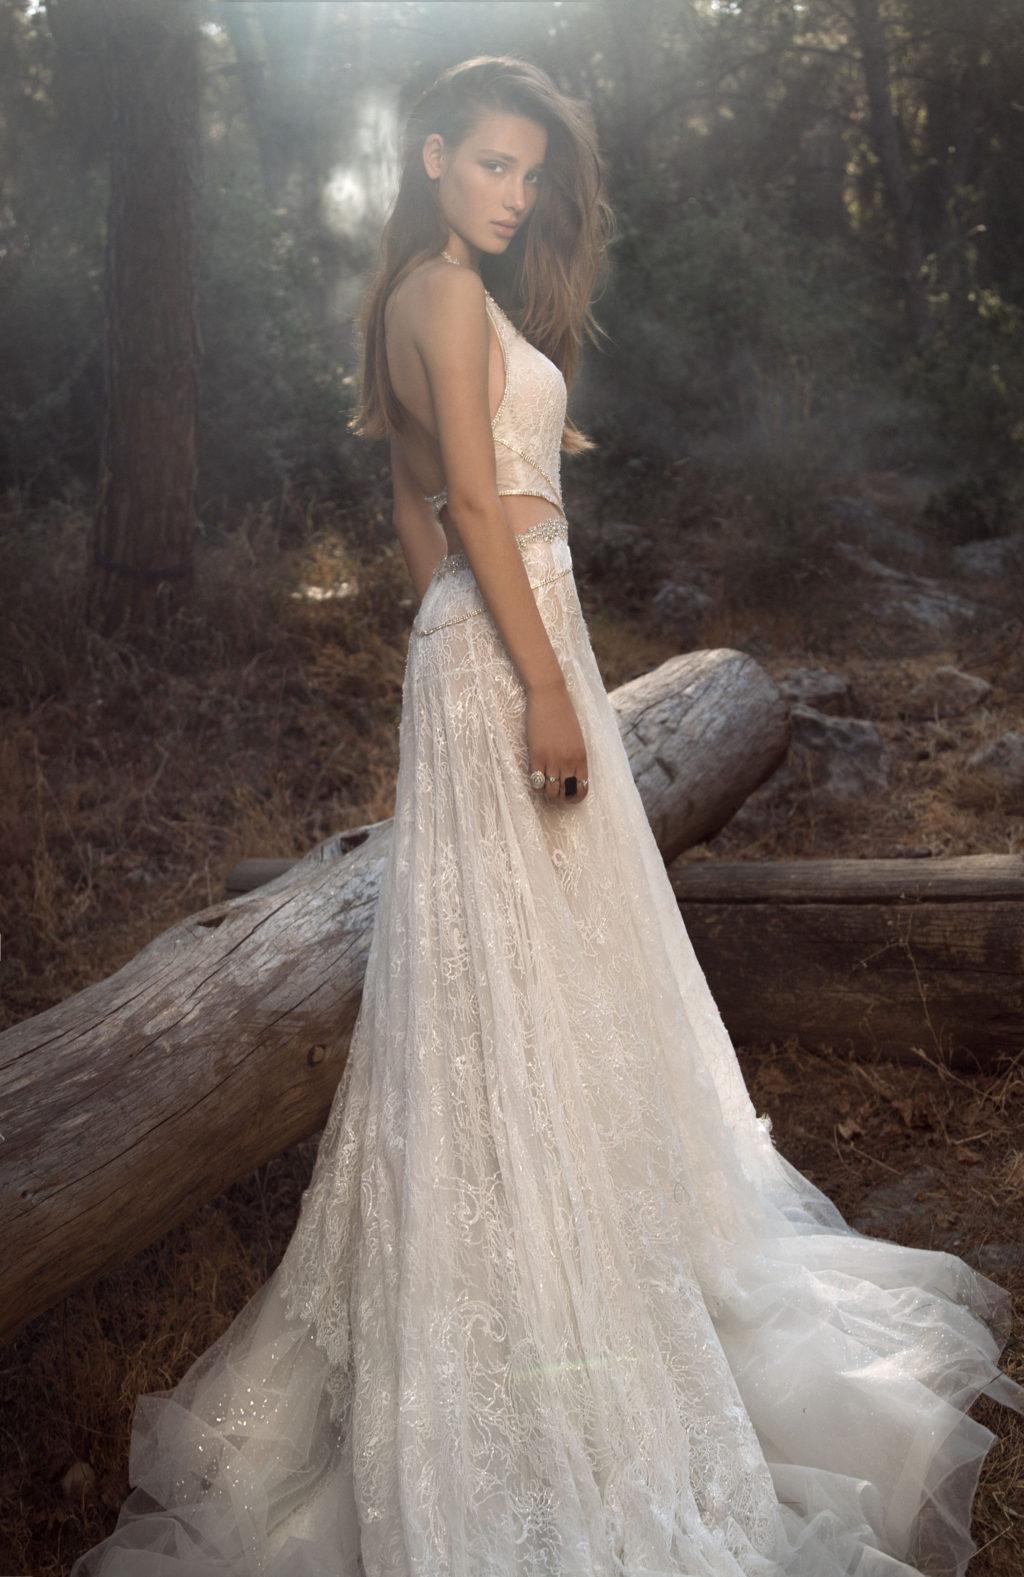 Galia Lahav 2017 9 - Nueva Colección Vestidos de Novia Galia Lahav 2017